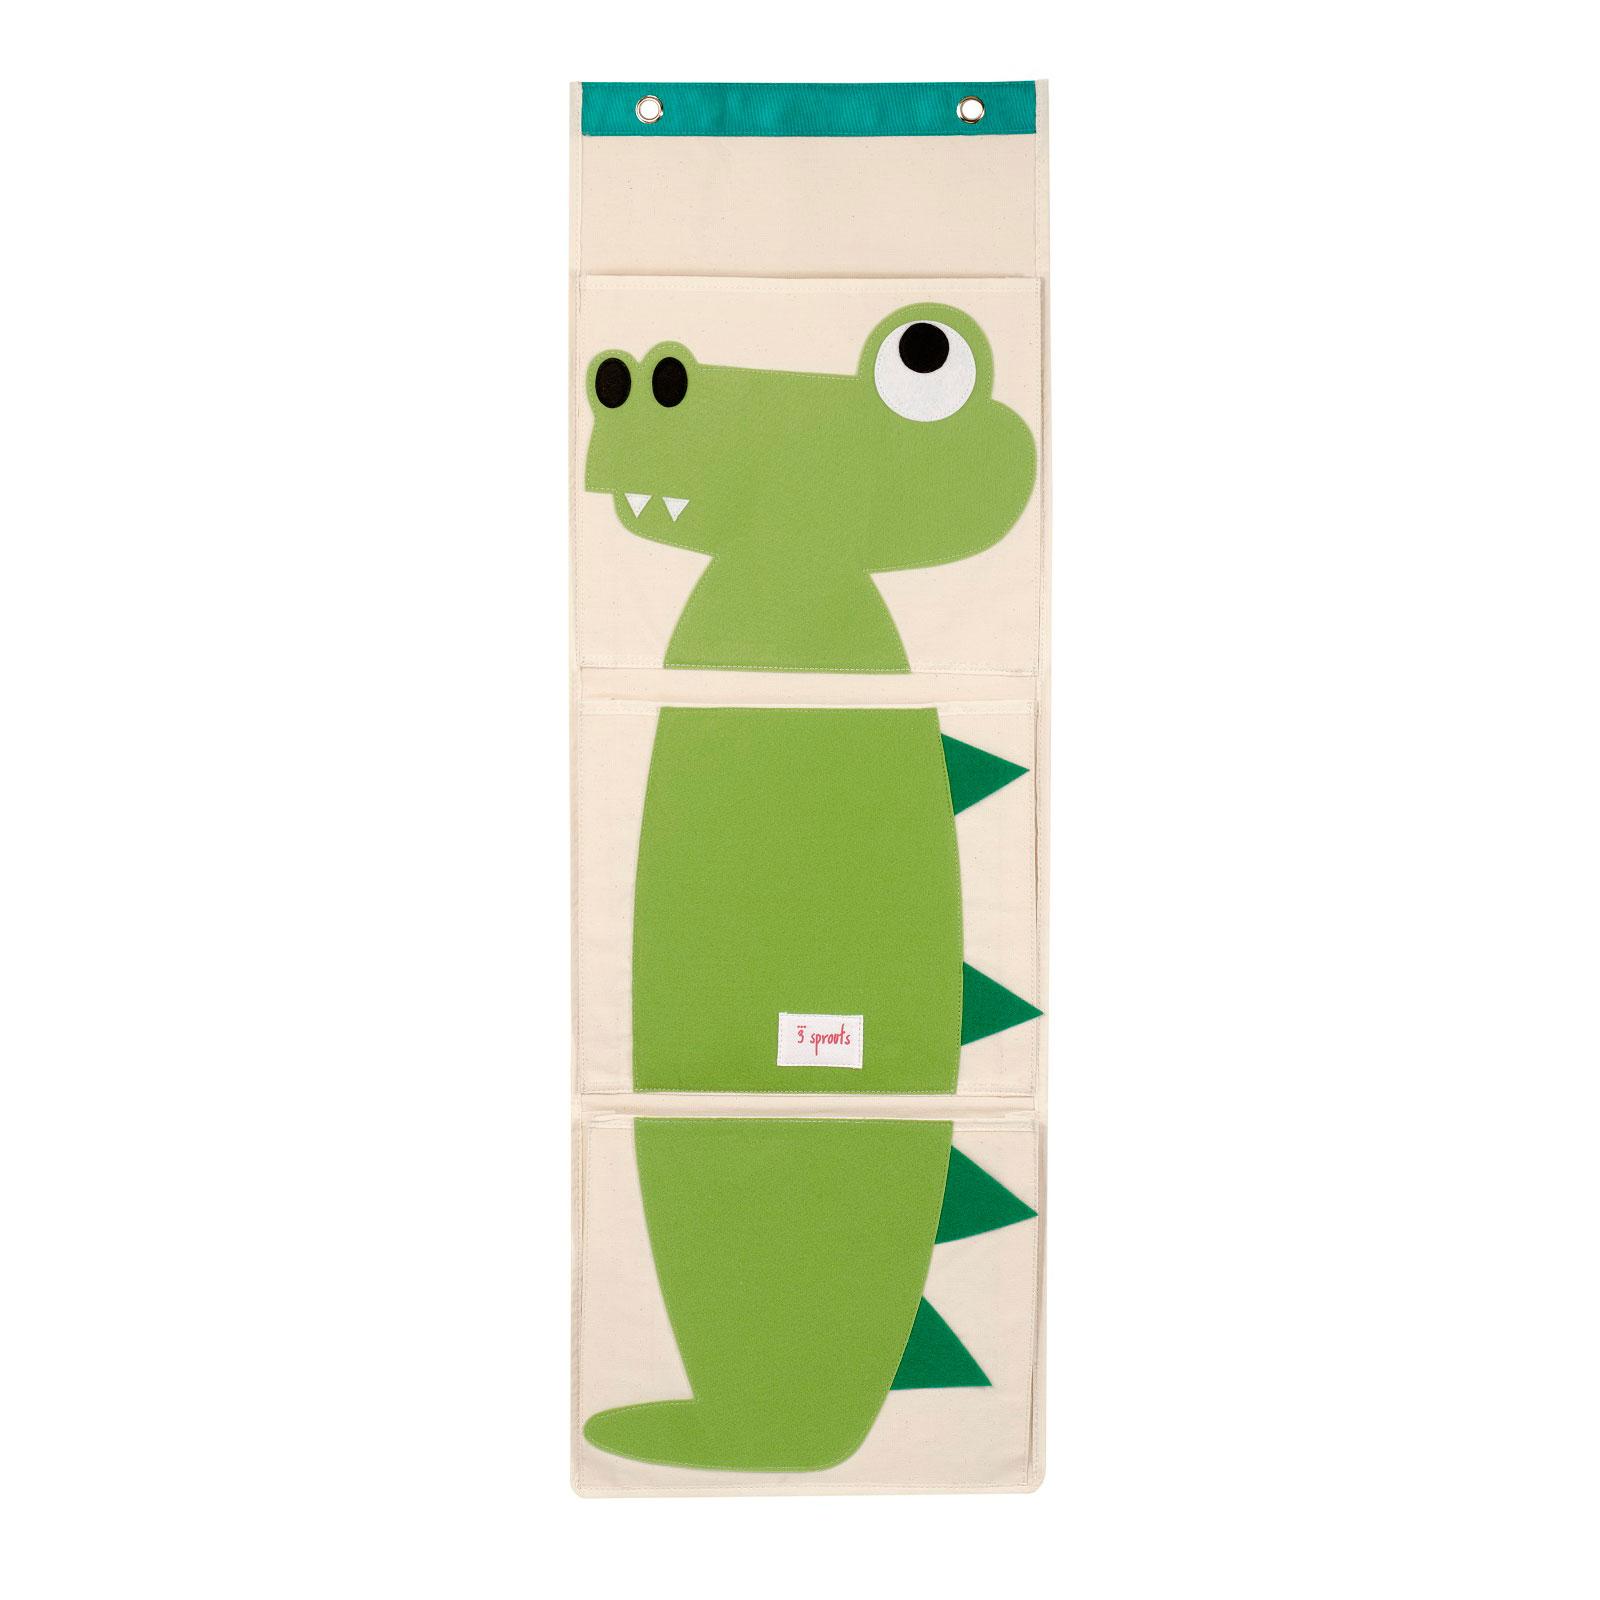 Органайзер на стену 3 Sprouts Крокодил (Green Crocodile) Арт. 67401<br>